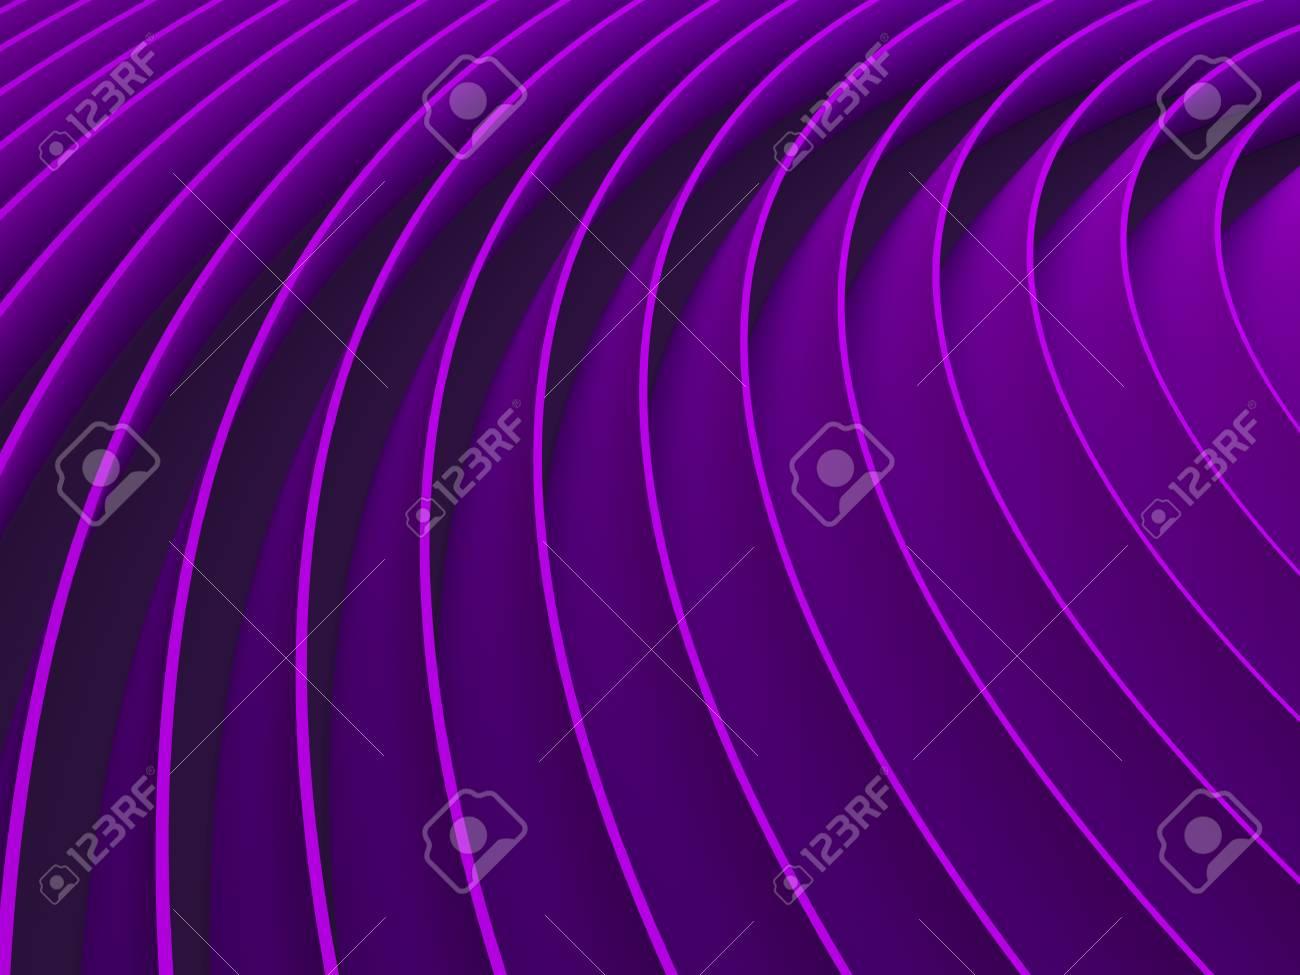 Purple High Resolution Geometric Background Texture Works Good